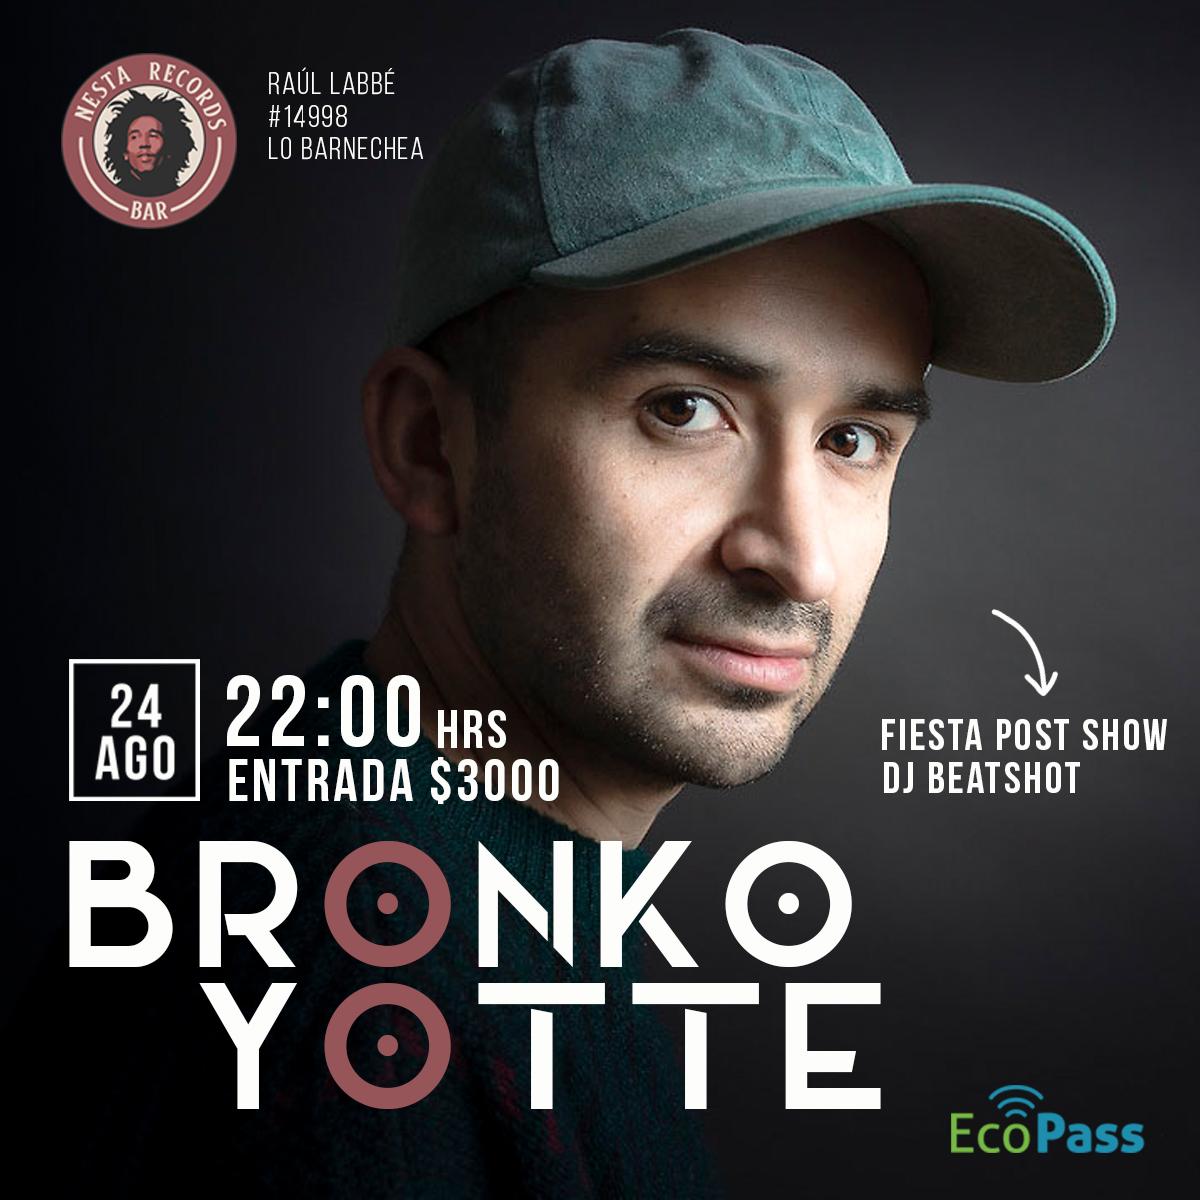 Bronko ecopass